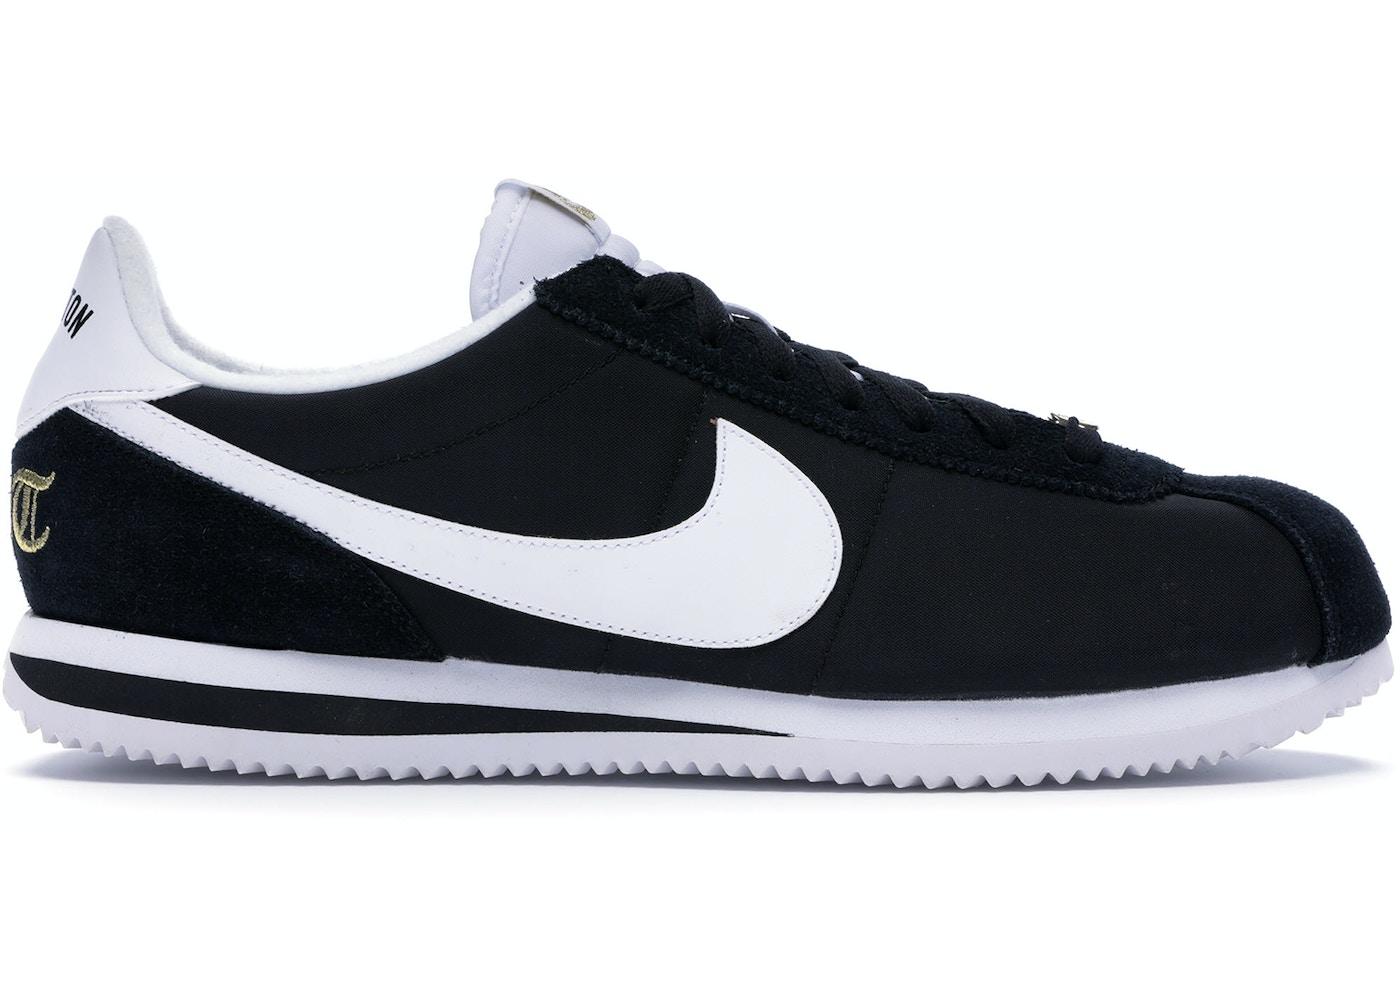 promo code e84a1 3b2e6 Nike Cortez Basic Nylon Compton